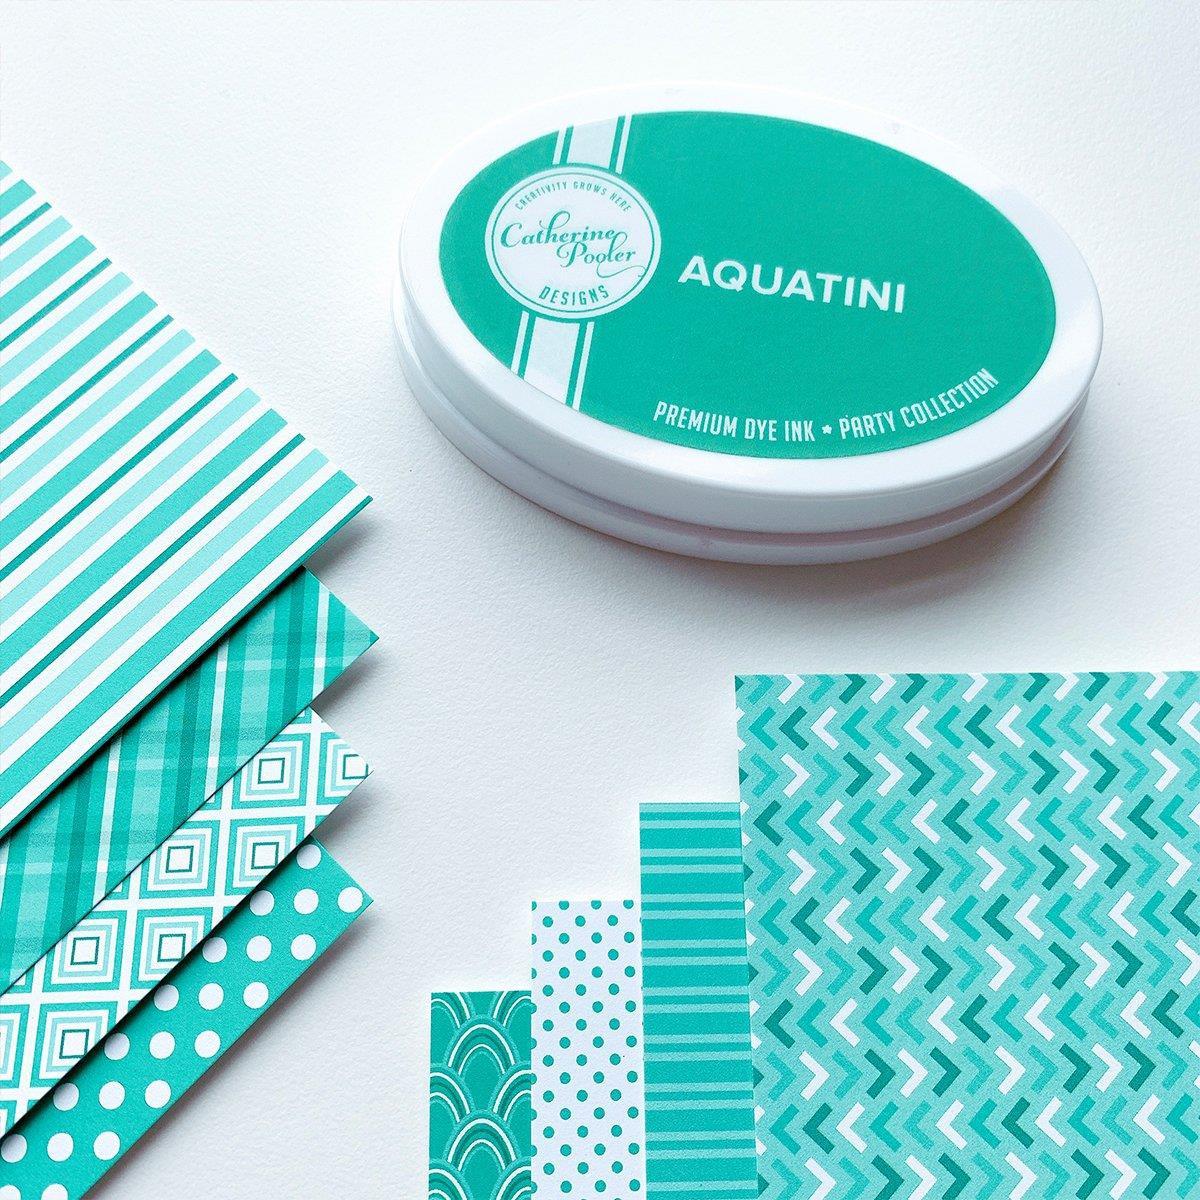 Aquatini Prints, Catherine Pooler Patterned Paper -